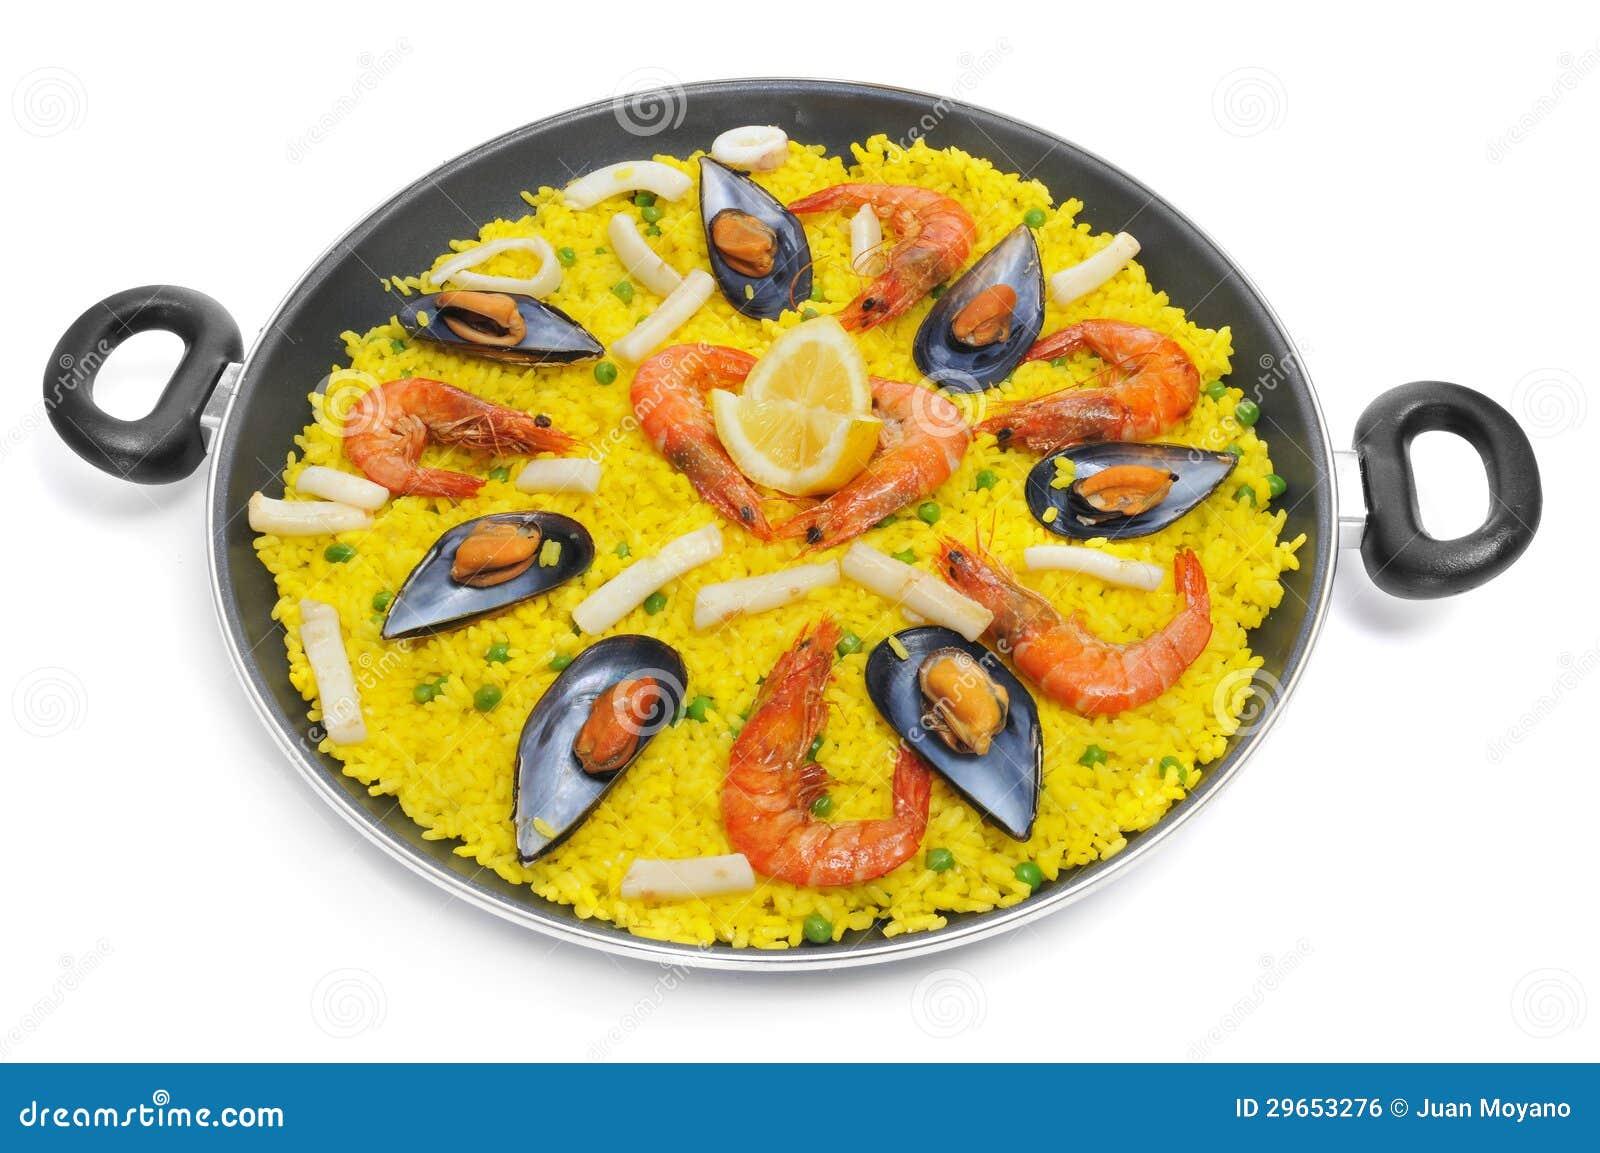 Paella espagnole photo stock image du gourmet - 123rf image gratuite ...